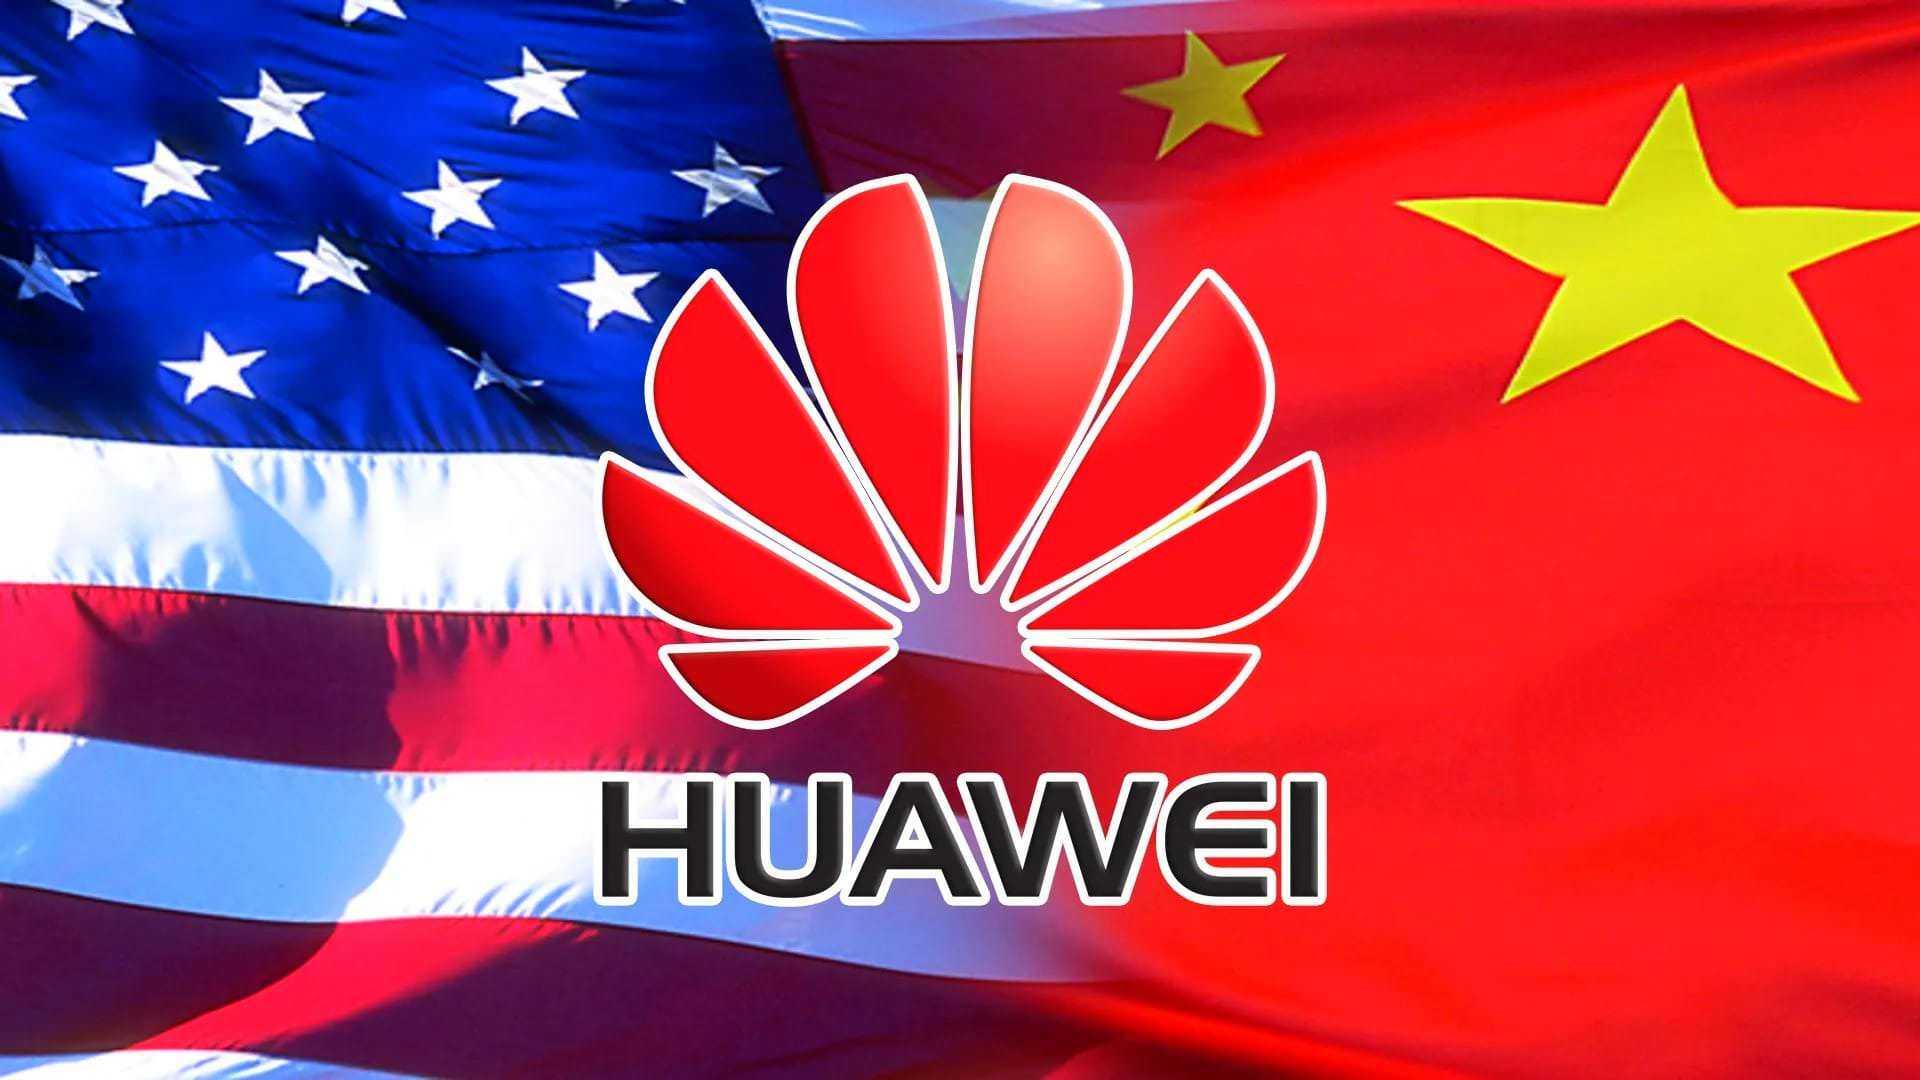 Сша хотят уничтожить huawei, huawei обгоняют в технологиях компании сша – новости руан